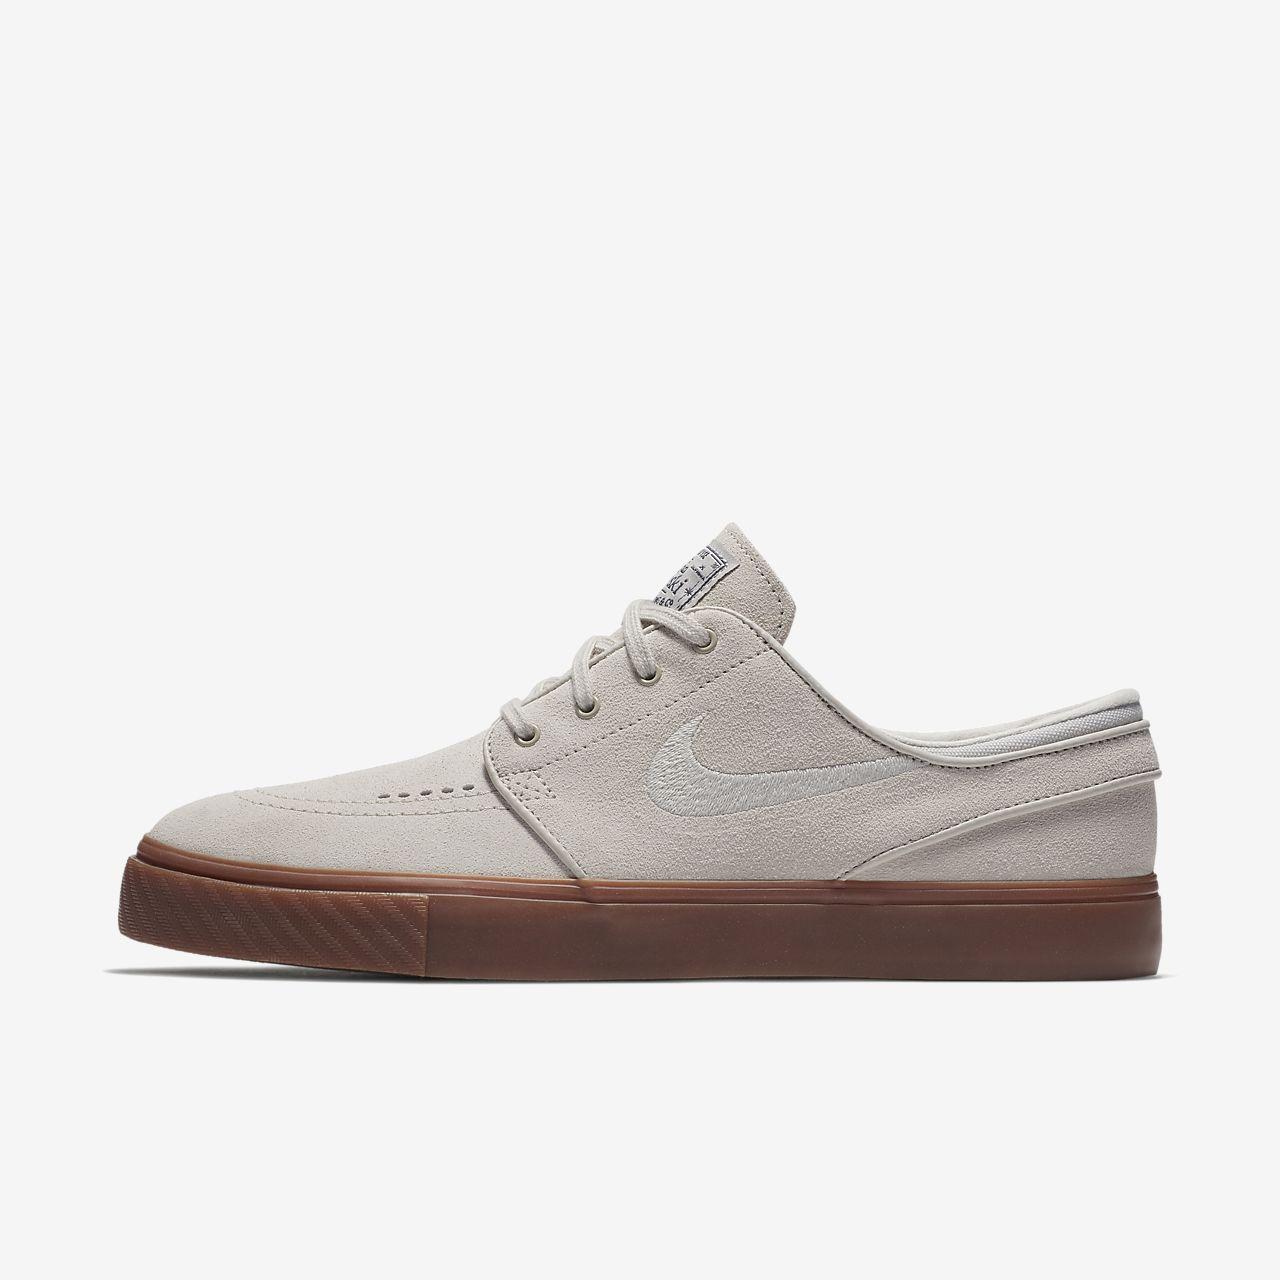 dc9f184f95aa5 reduced nike mens zoom stefan janoski skate shoe 75c61 837df